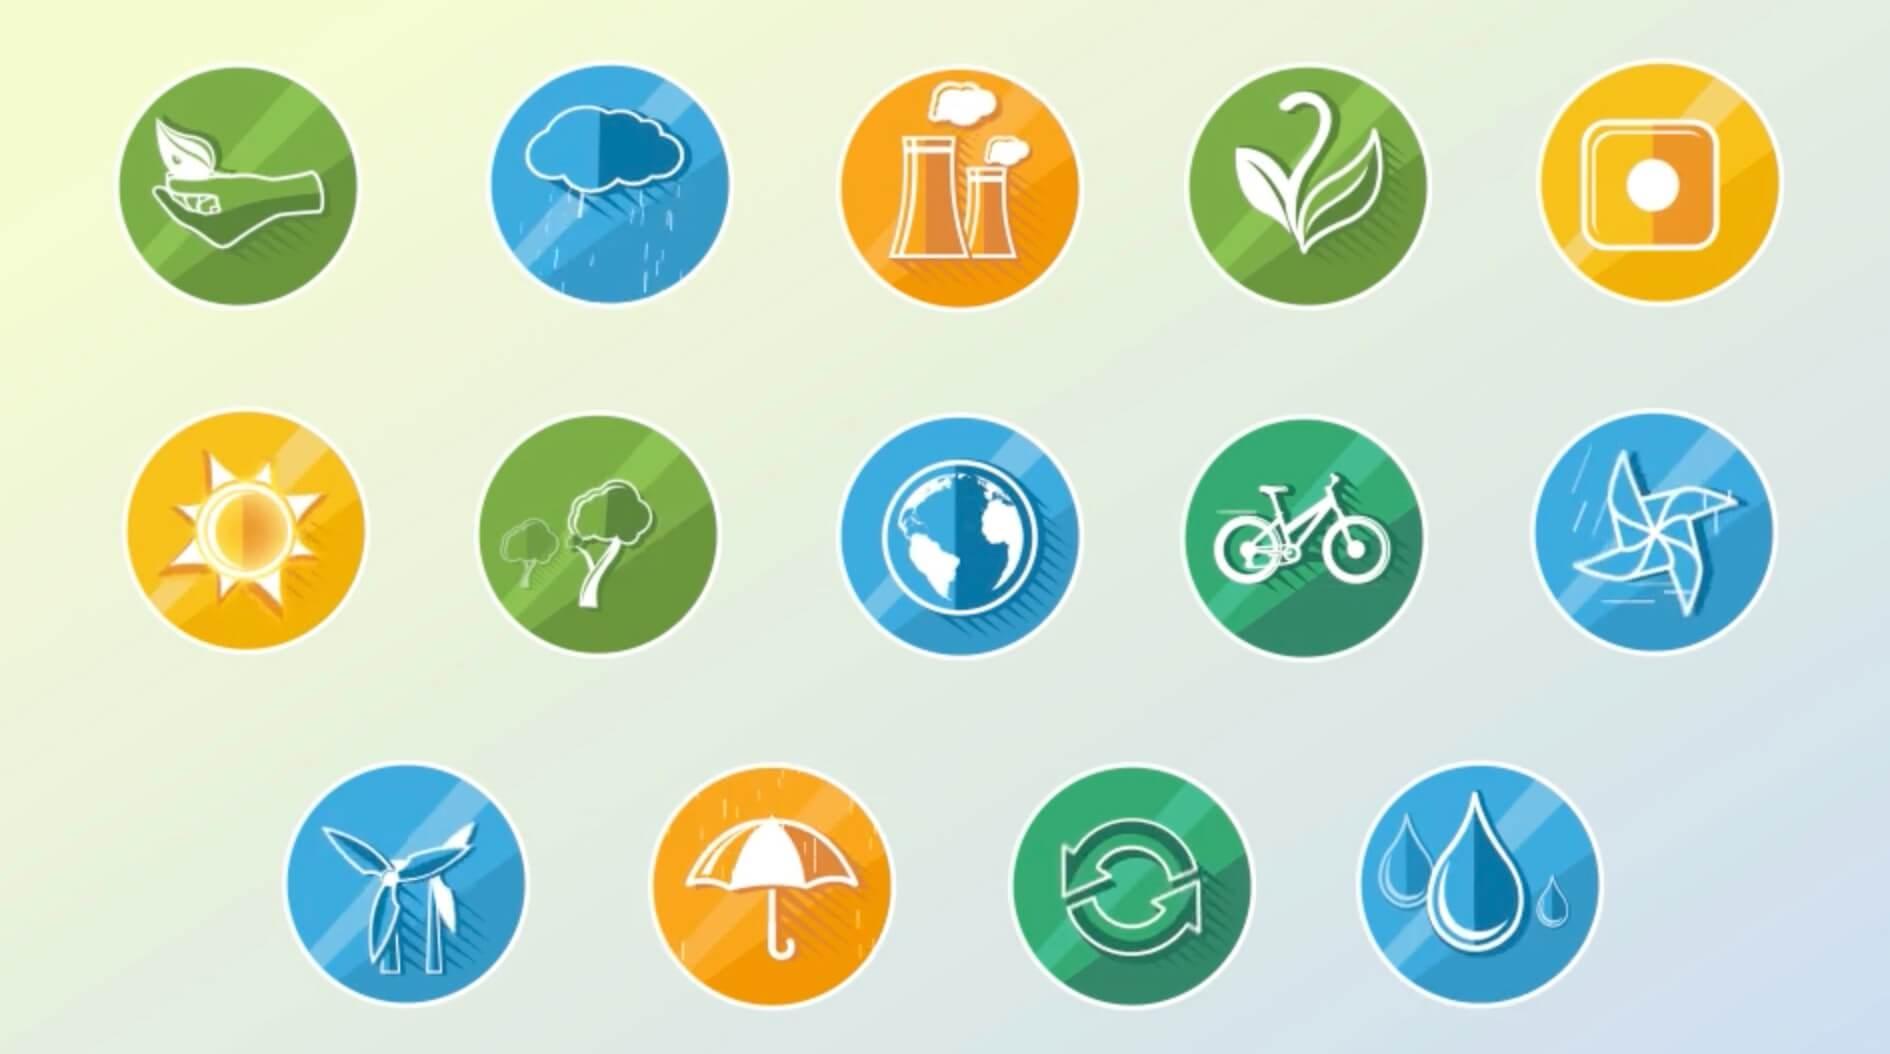 AE模板-生态概念动态icon图标插图1